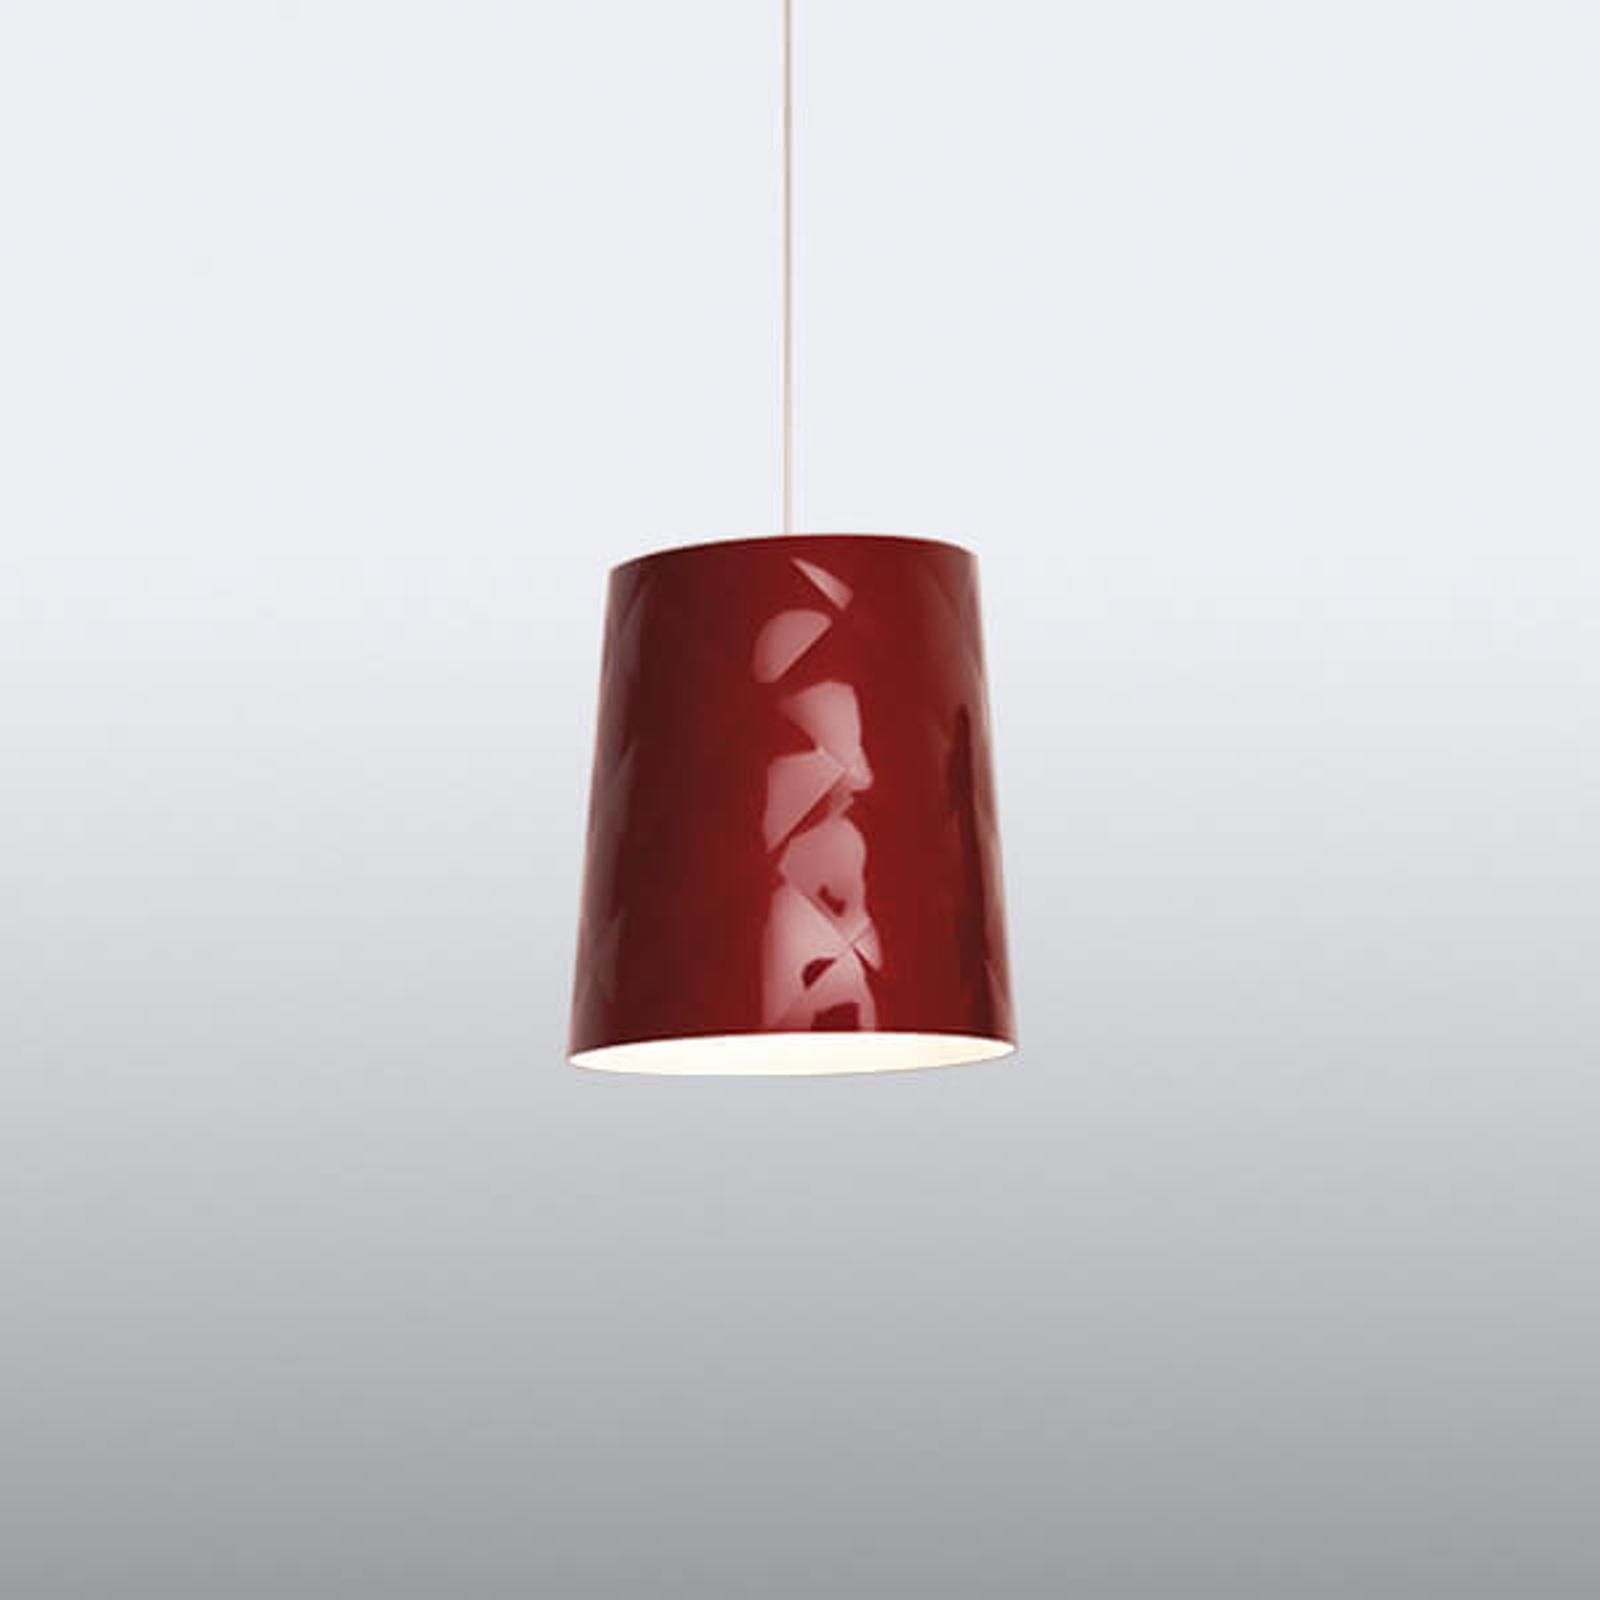 Kundalini New York hengelampe, Ø 33 cm, rød